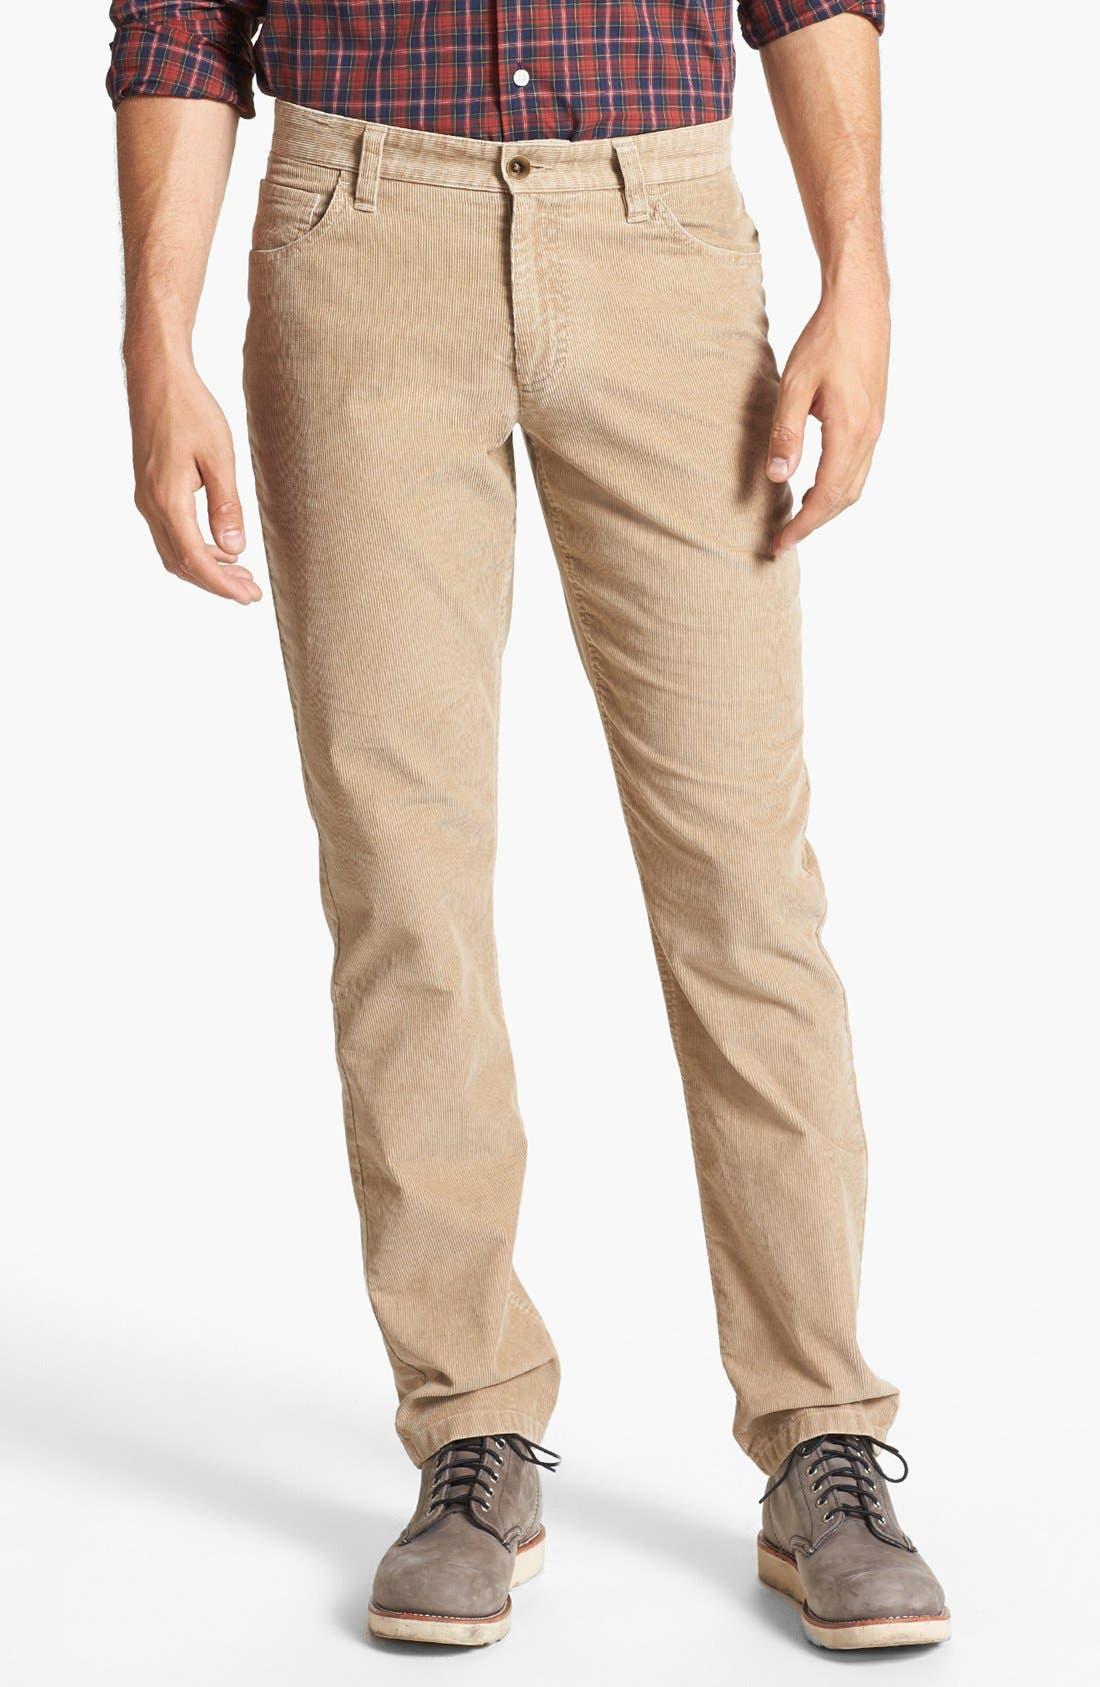 Main Image - Wallin & Bros. Corduroy Pants